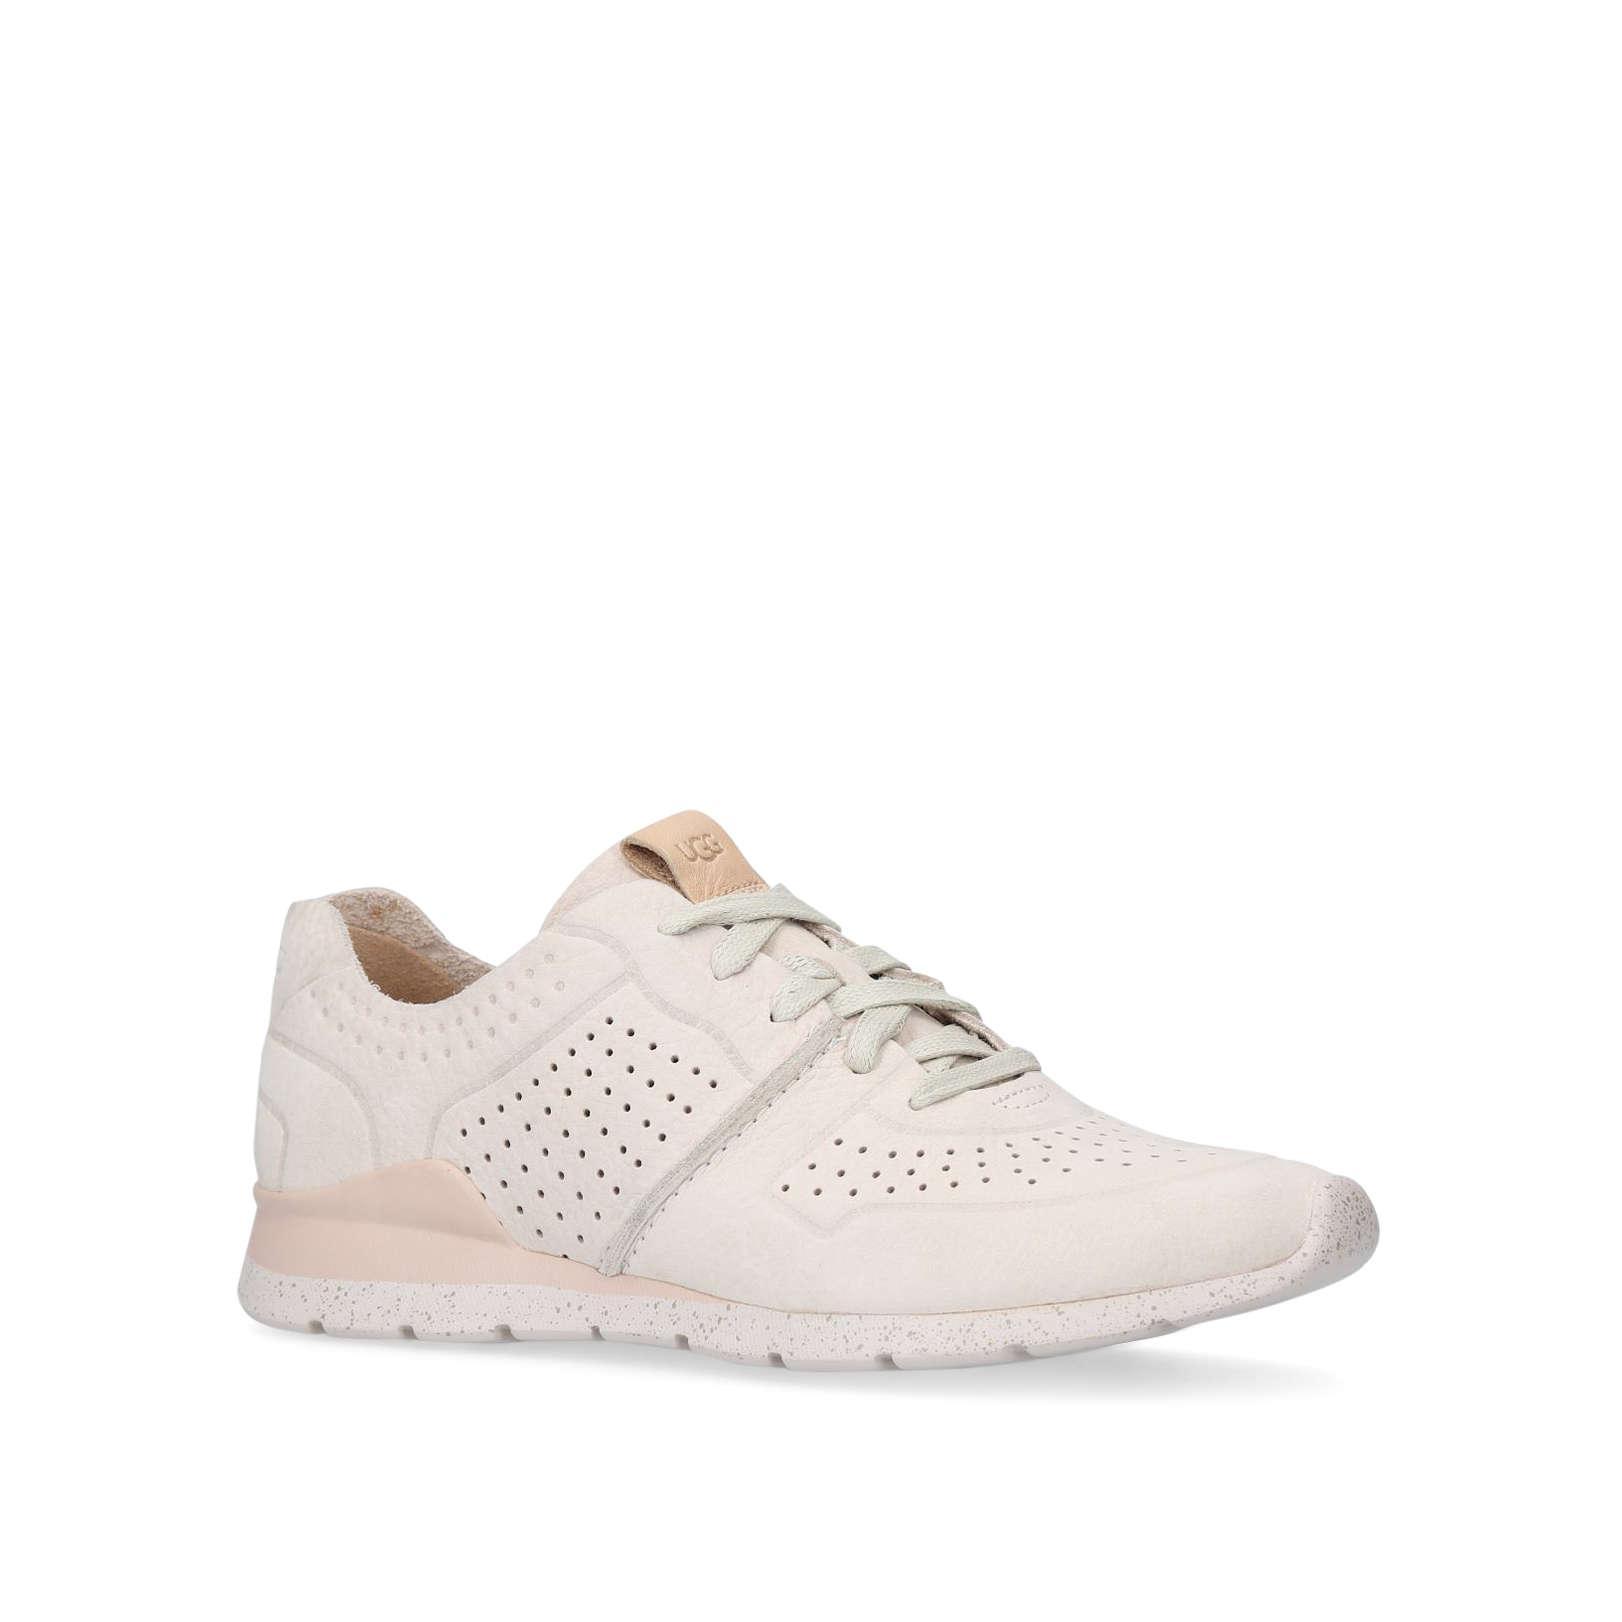 UGG Leather Tye No Heel Sneakers Winter Wht in White